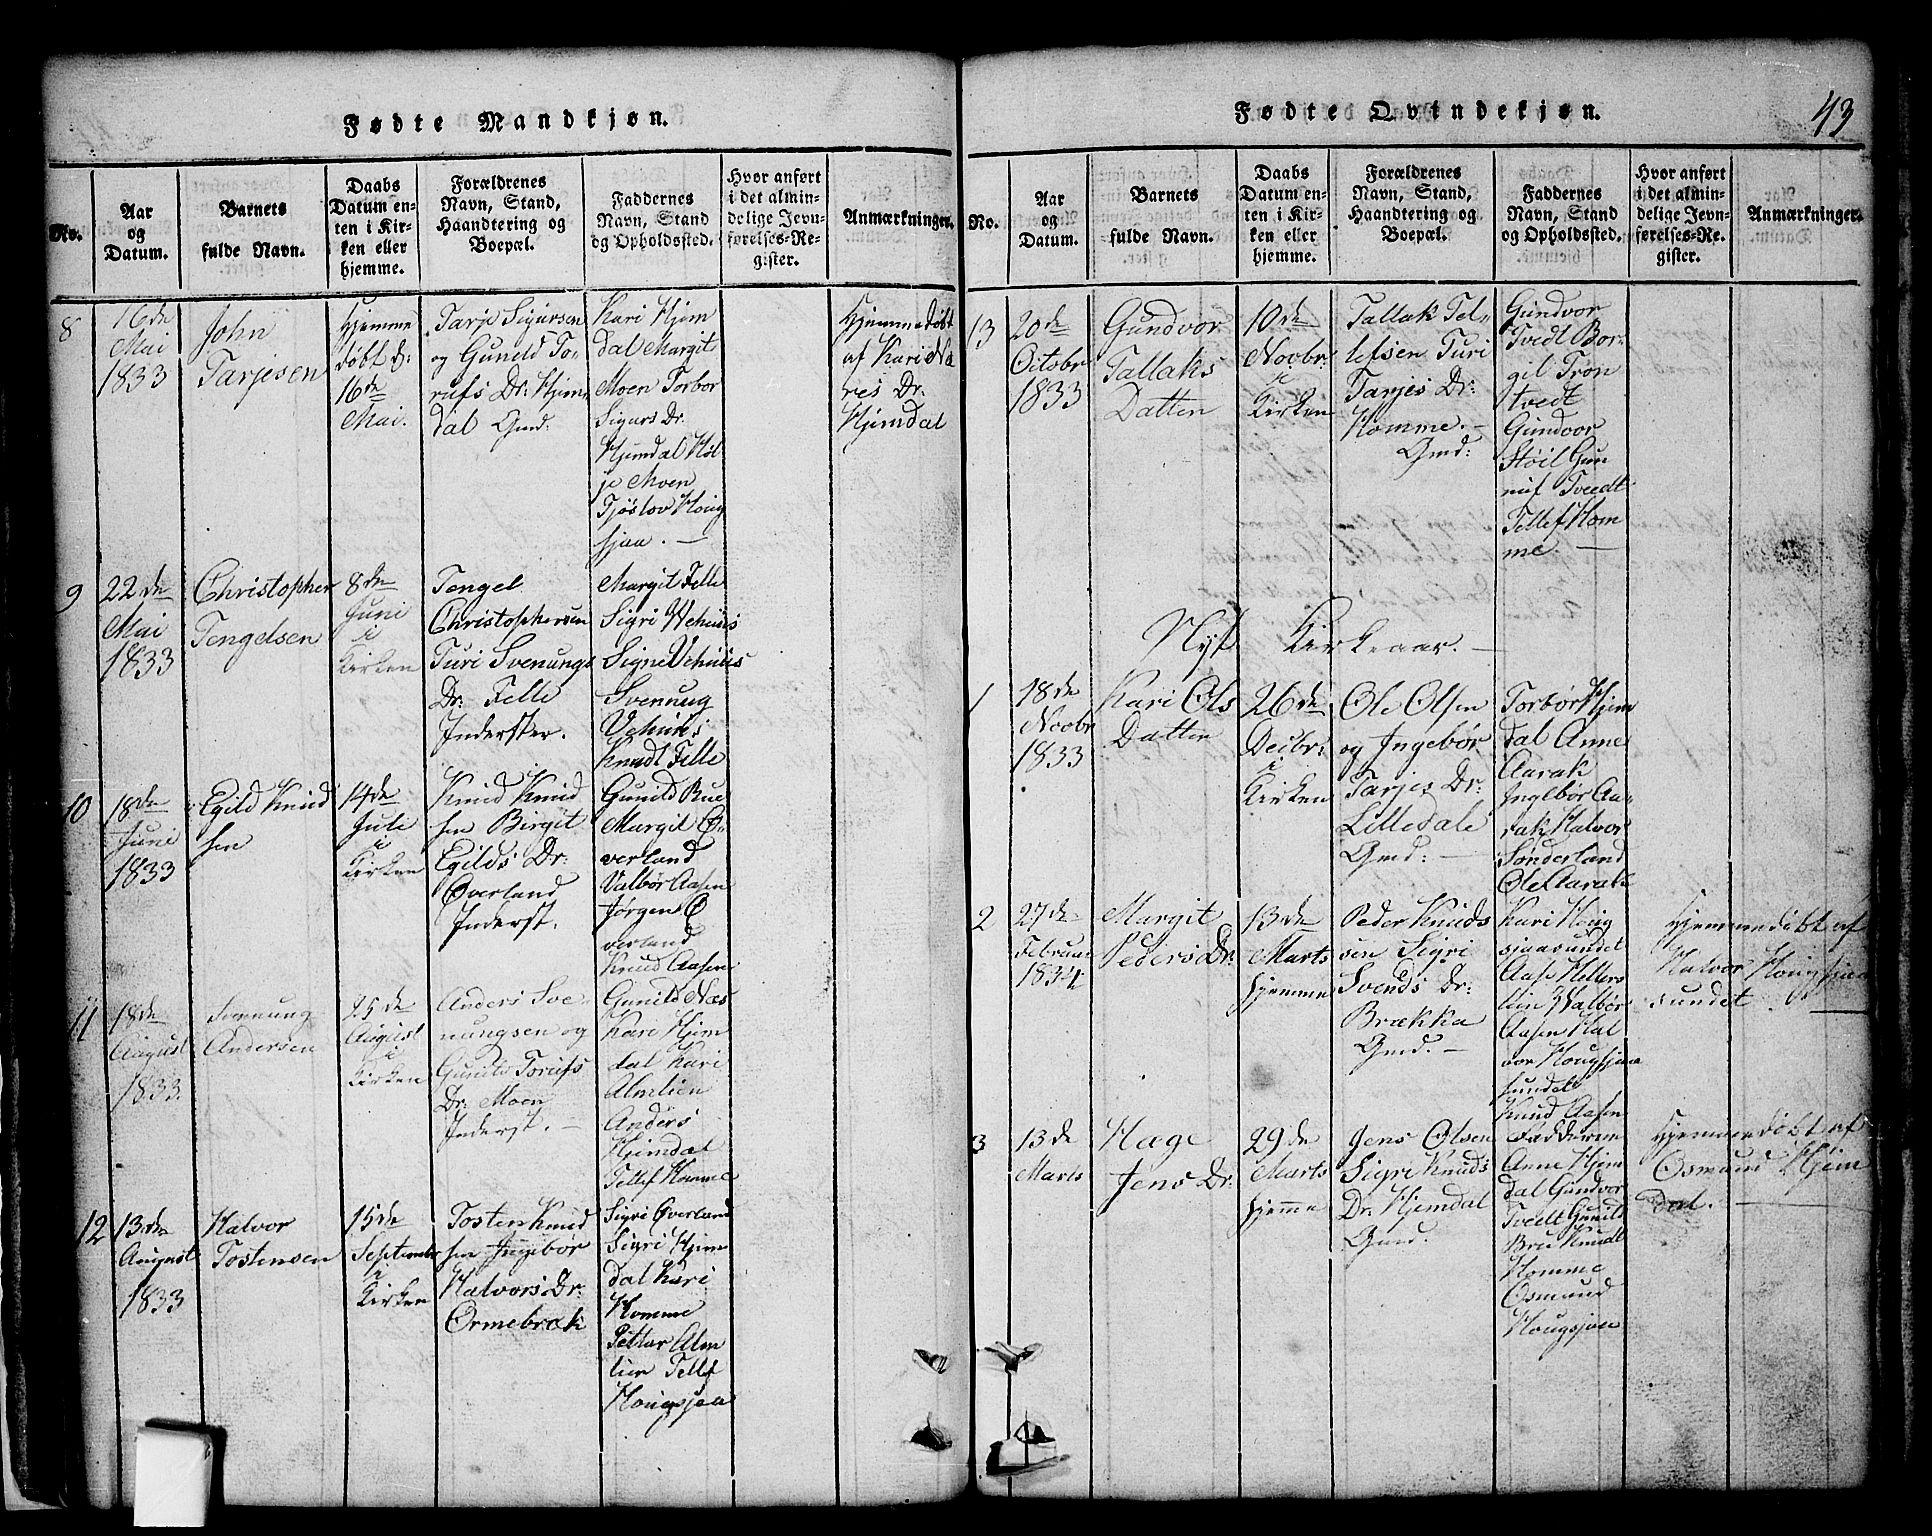 SAKO, Nissedal kirkebøker, G/Gb/L0001: Klokkerbok nr. II 1, 1814-1862, s. 43